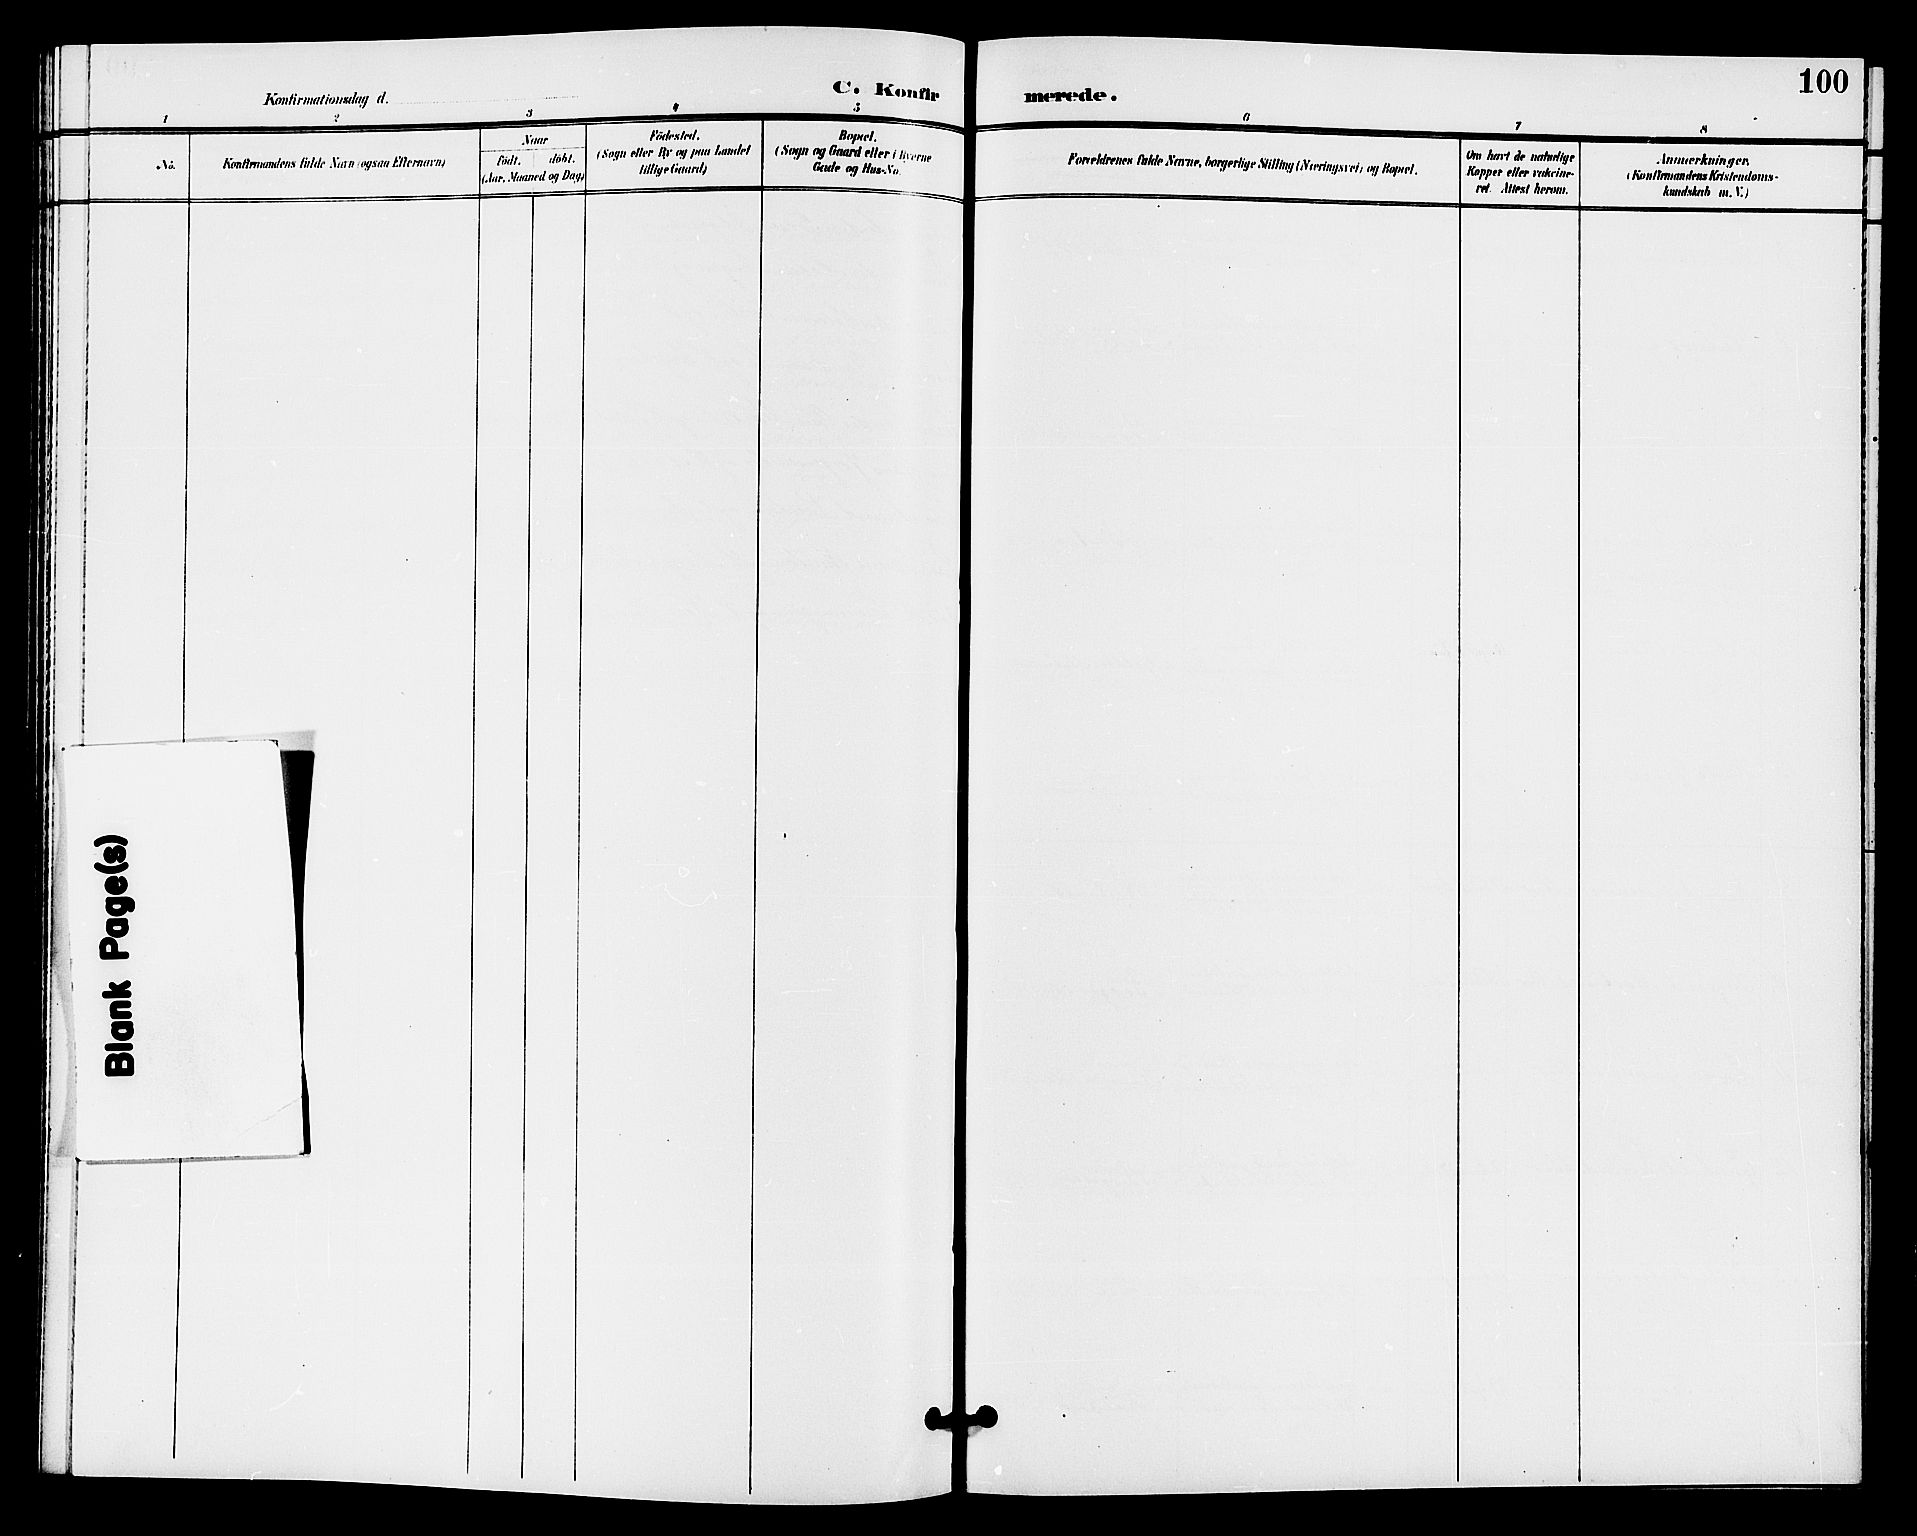 SAKO, Bø kirkebøker, G/Ga/L0006: Klokkerbok nr. 6, 1898-1909, s. 100